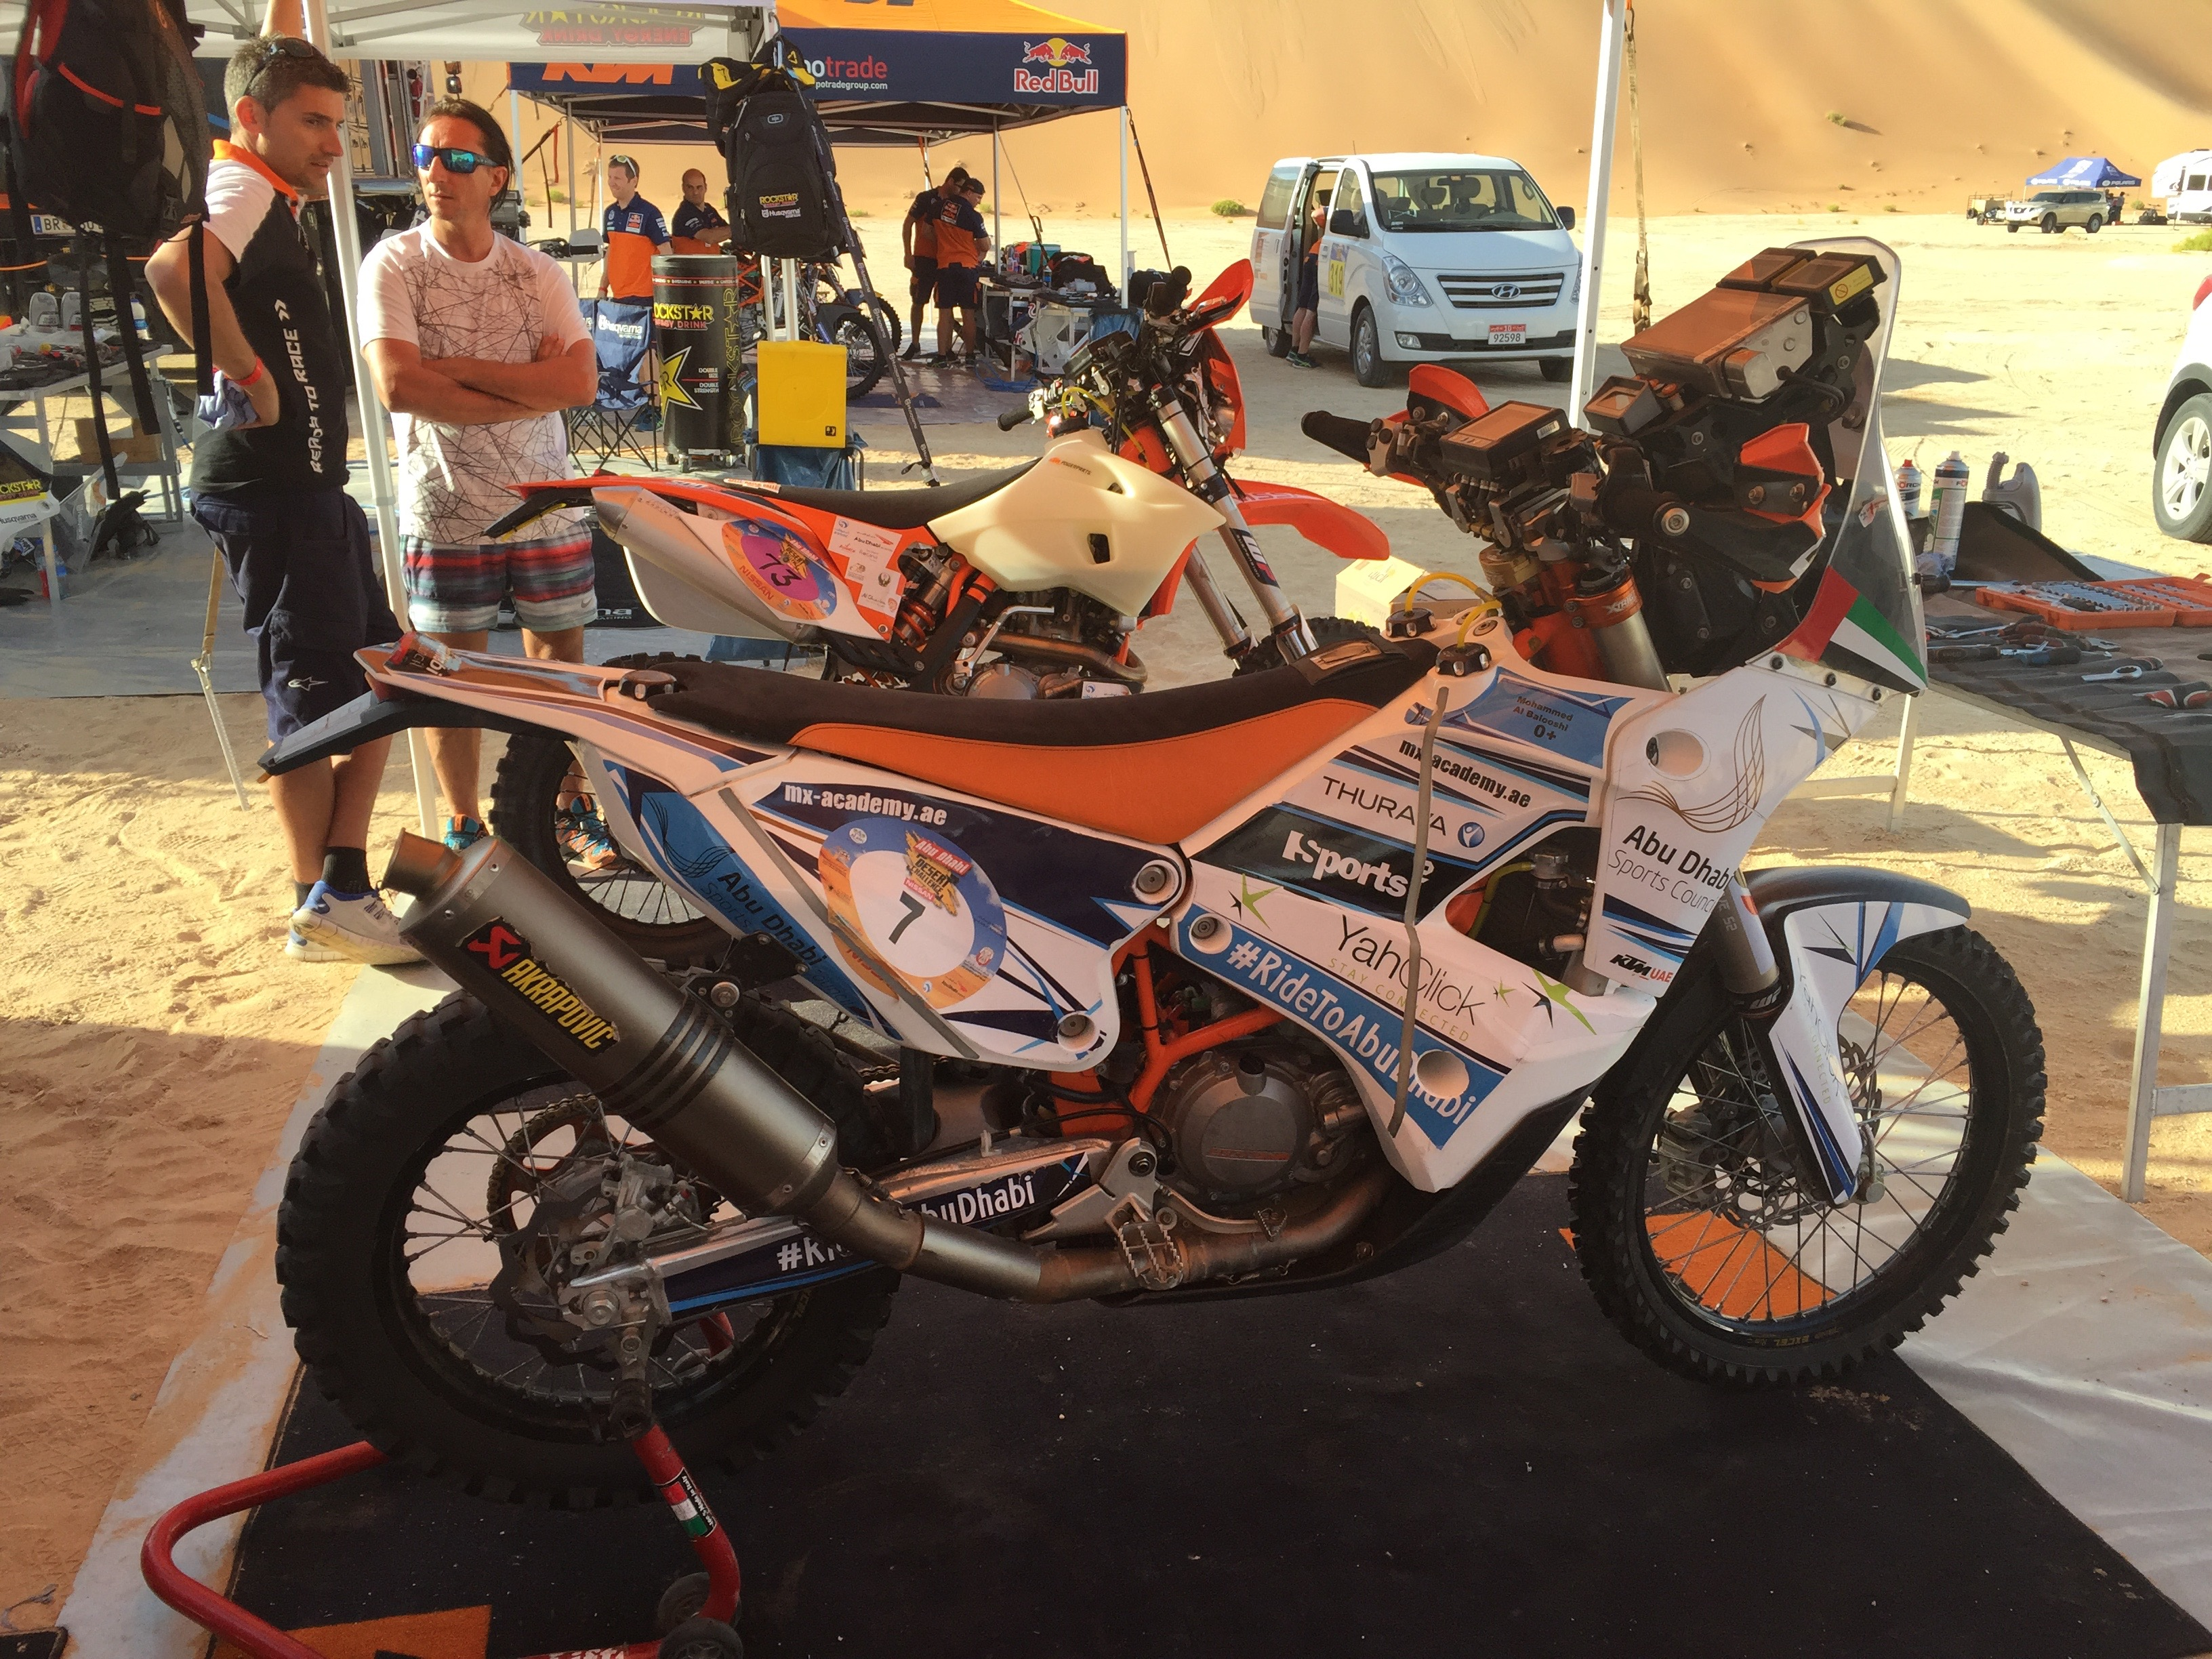 ADDC-2016-mohammed-balooshi-rally-bike-ktm-450-rally-replica